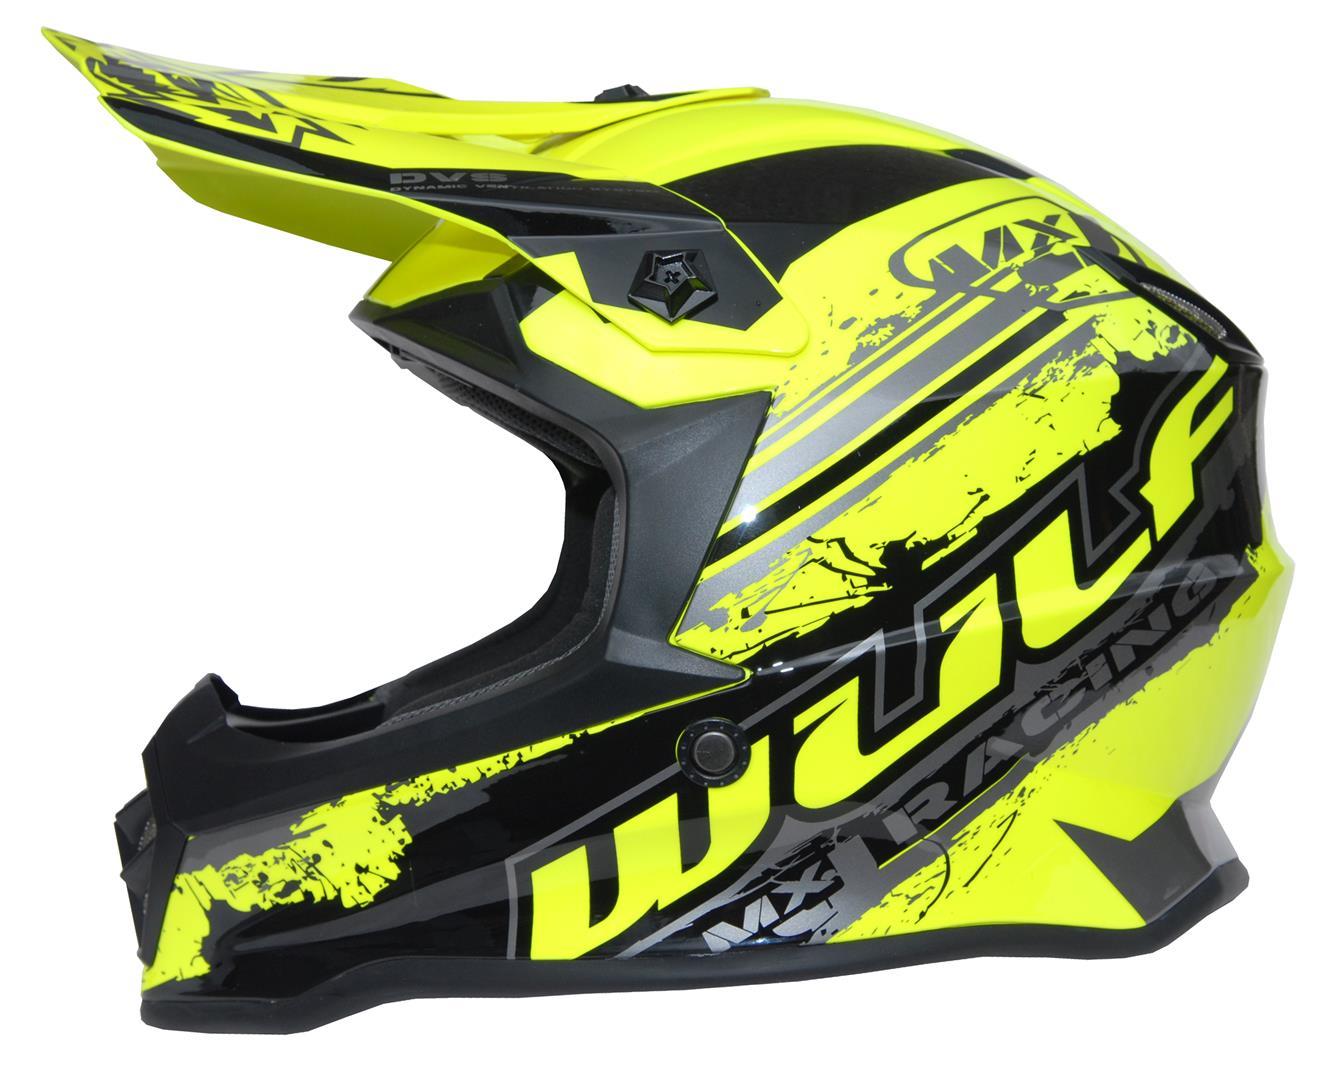 New 2021 Wulfsport Kids Off Road Pro Helmet - Yellow